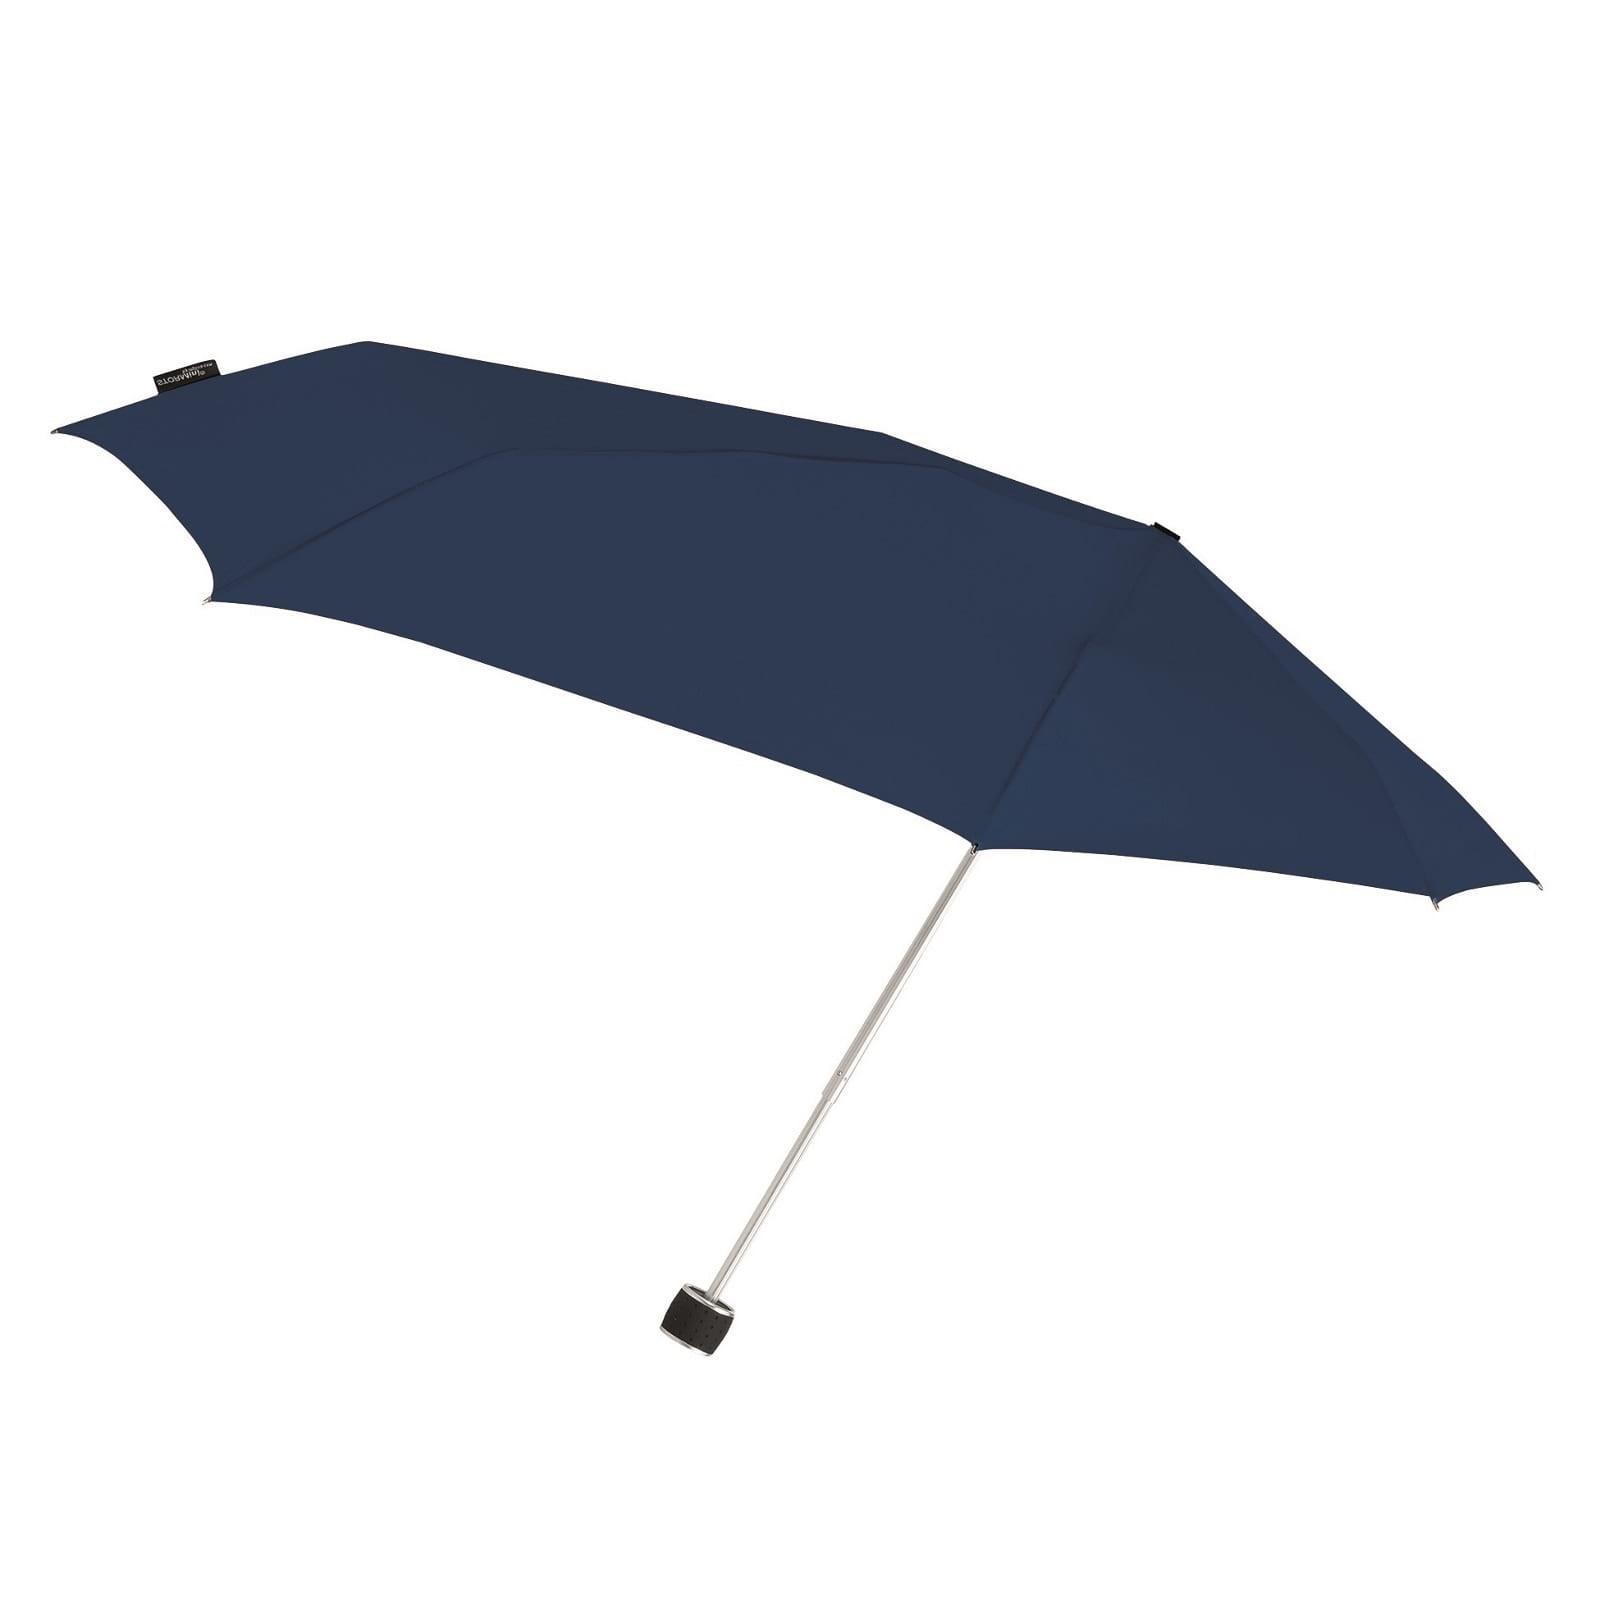 STORMini® Folding Storm Umbrella (Dark Blue) - Impliva